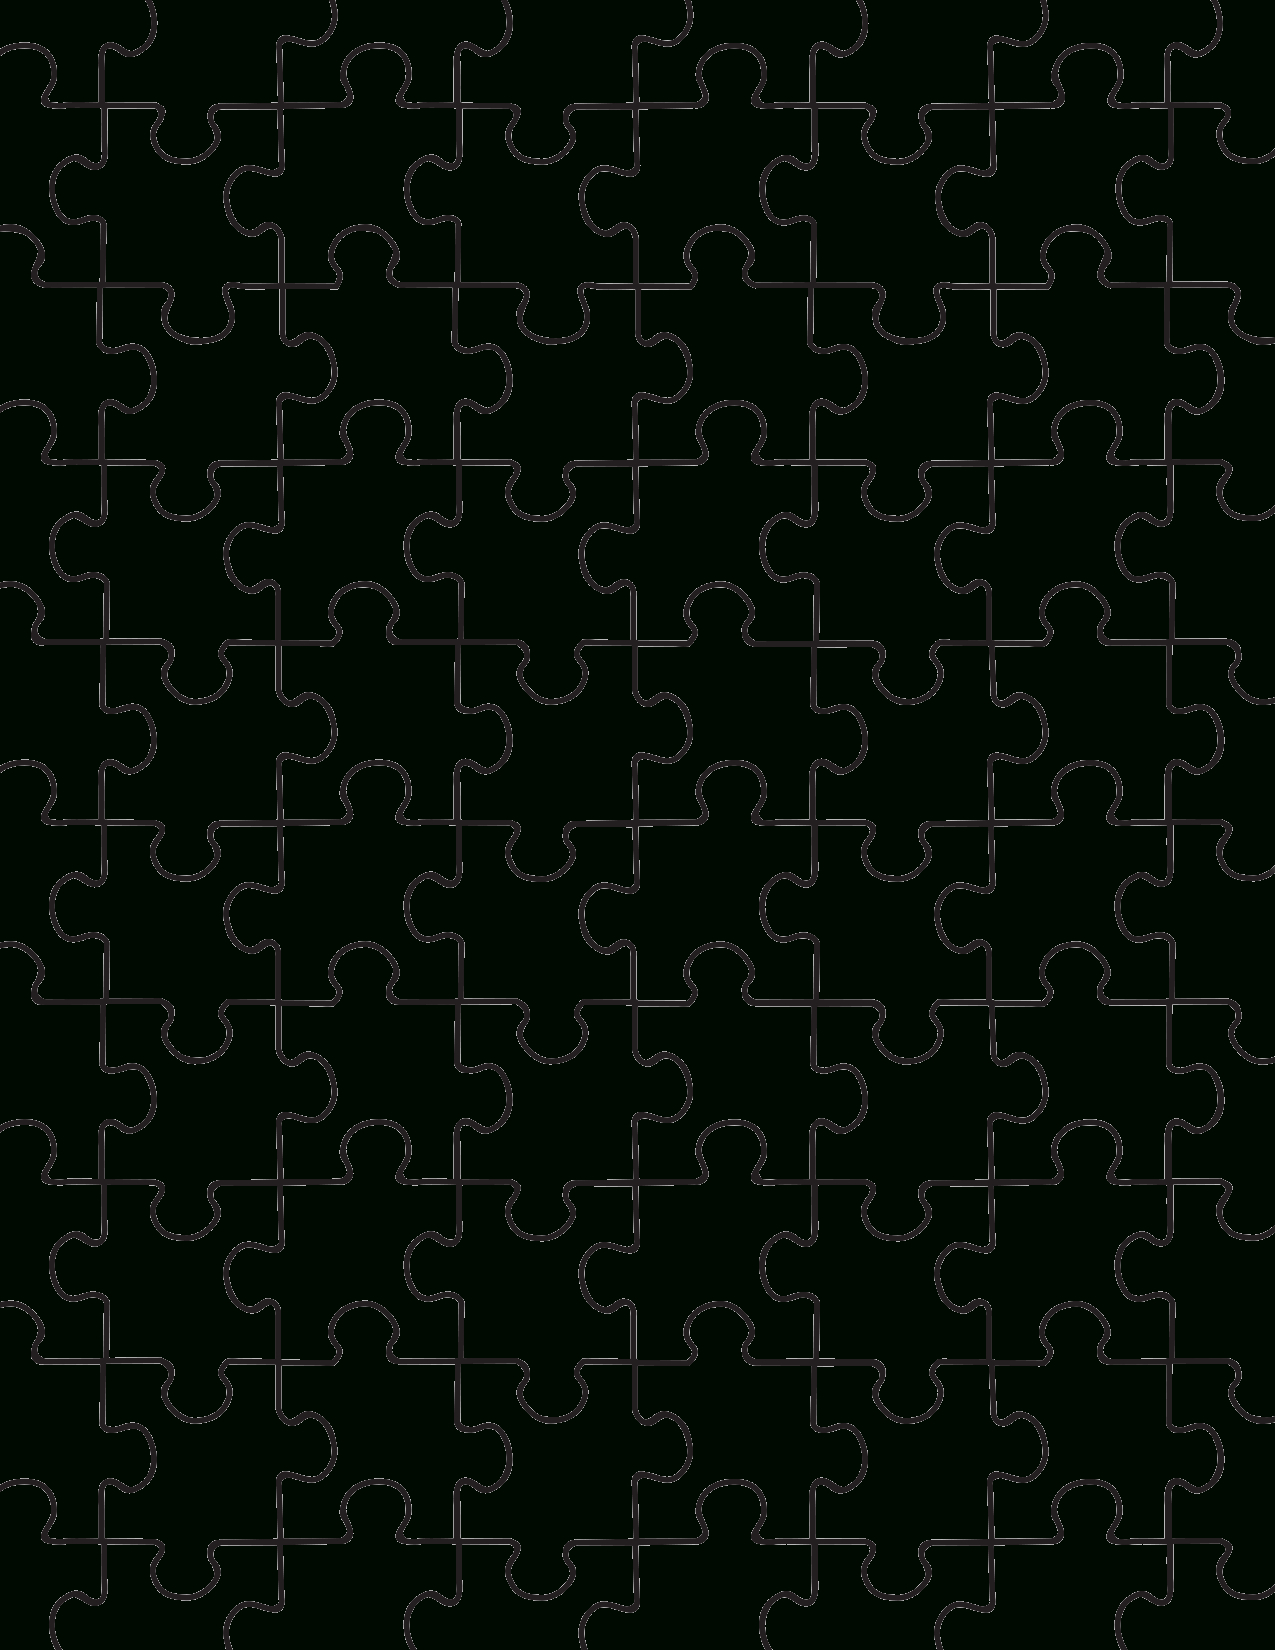 Printable Puzzle Pieces Template | Lovetoknow - Printable Puzzle Template Pdf